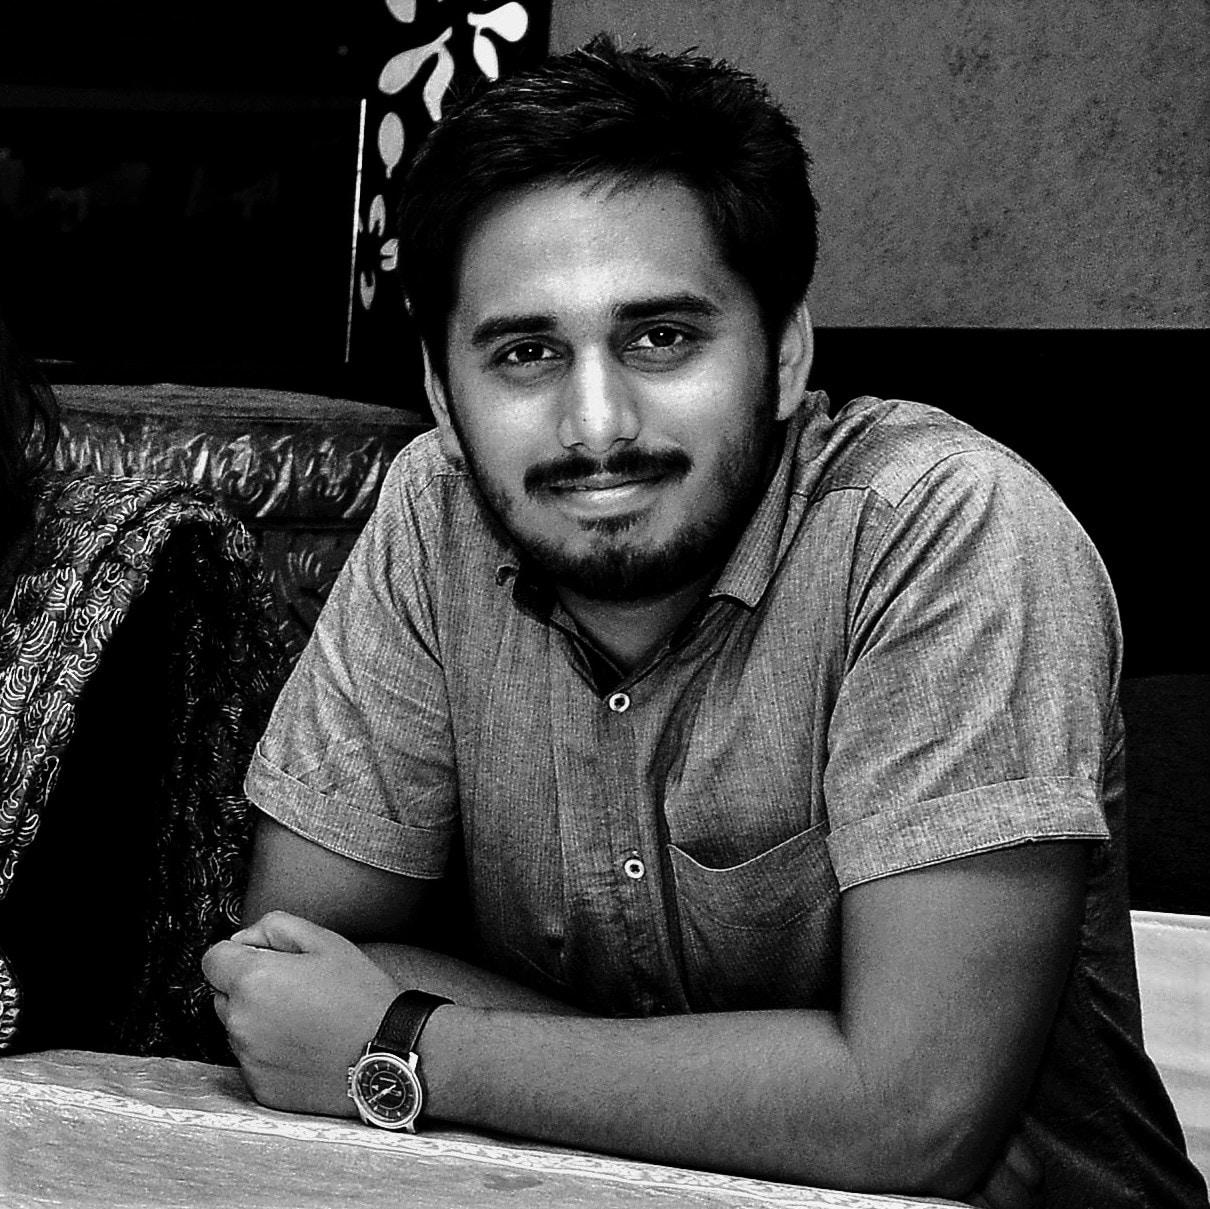 Go to Saksham Khurana's profile